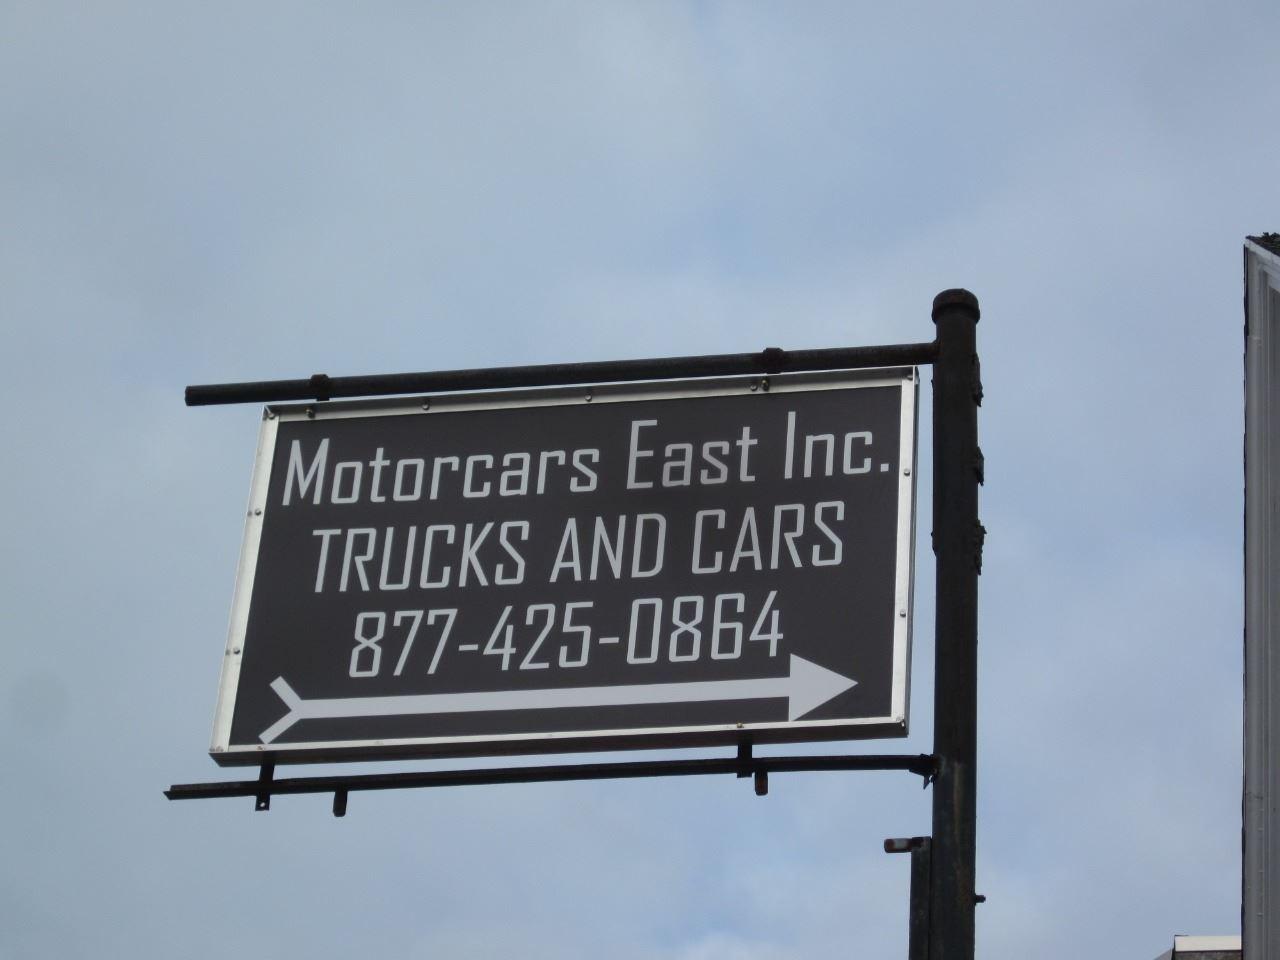 MOTORCARS EAST INC